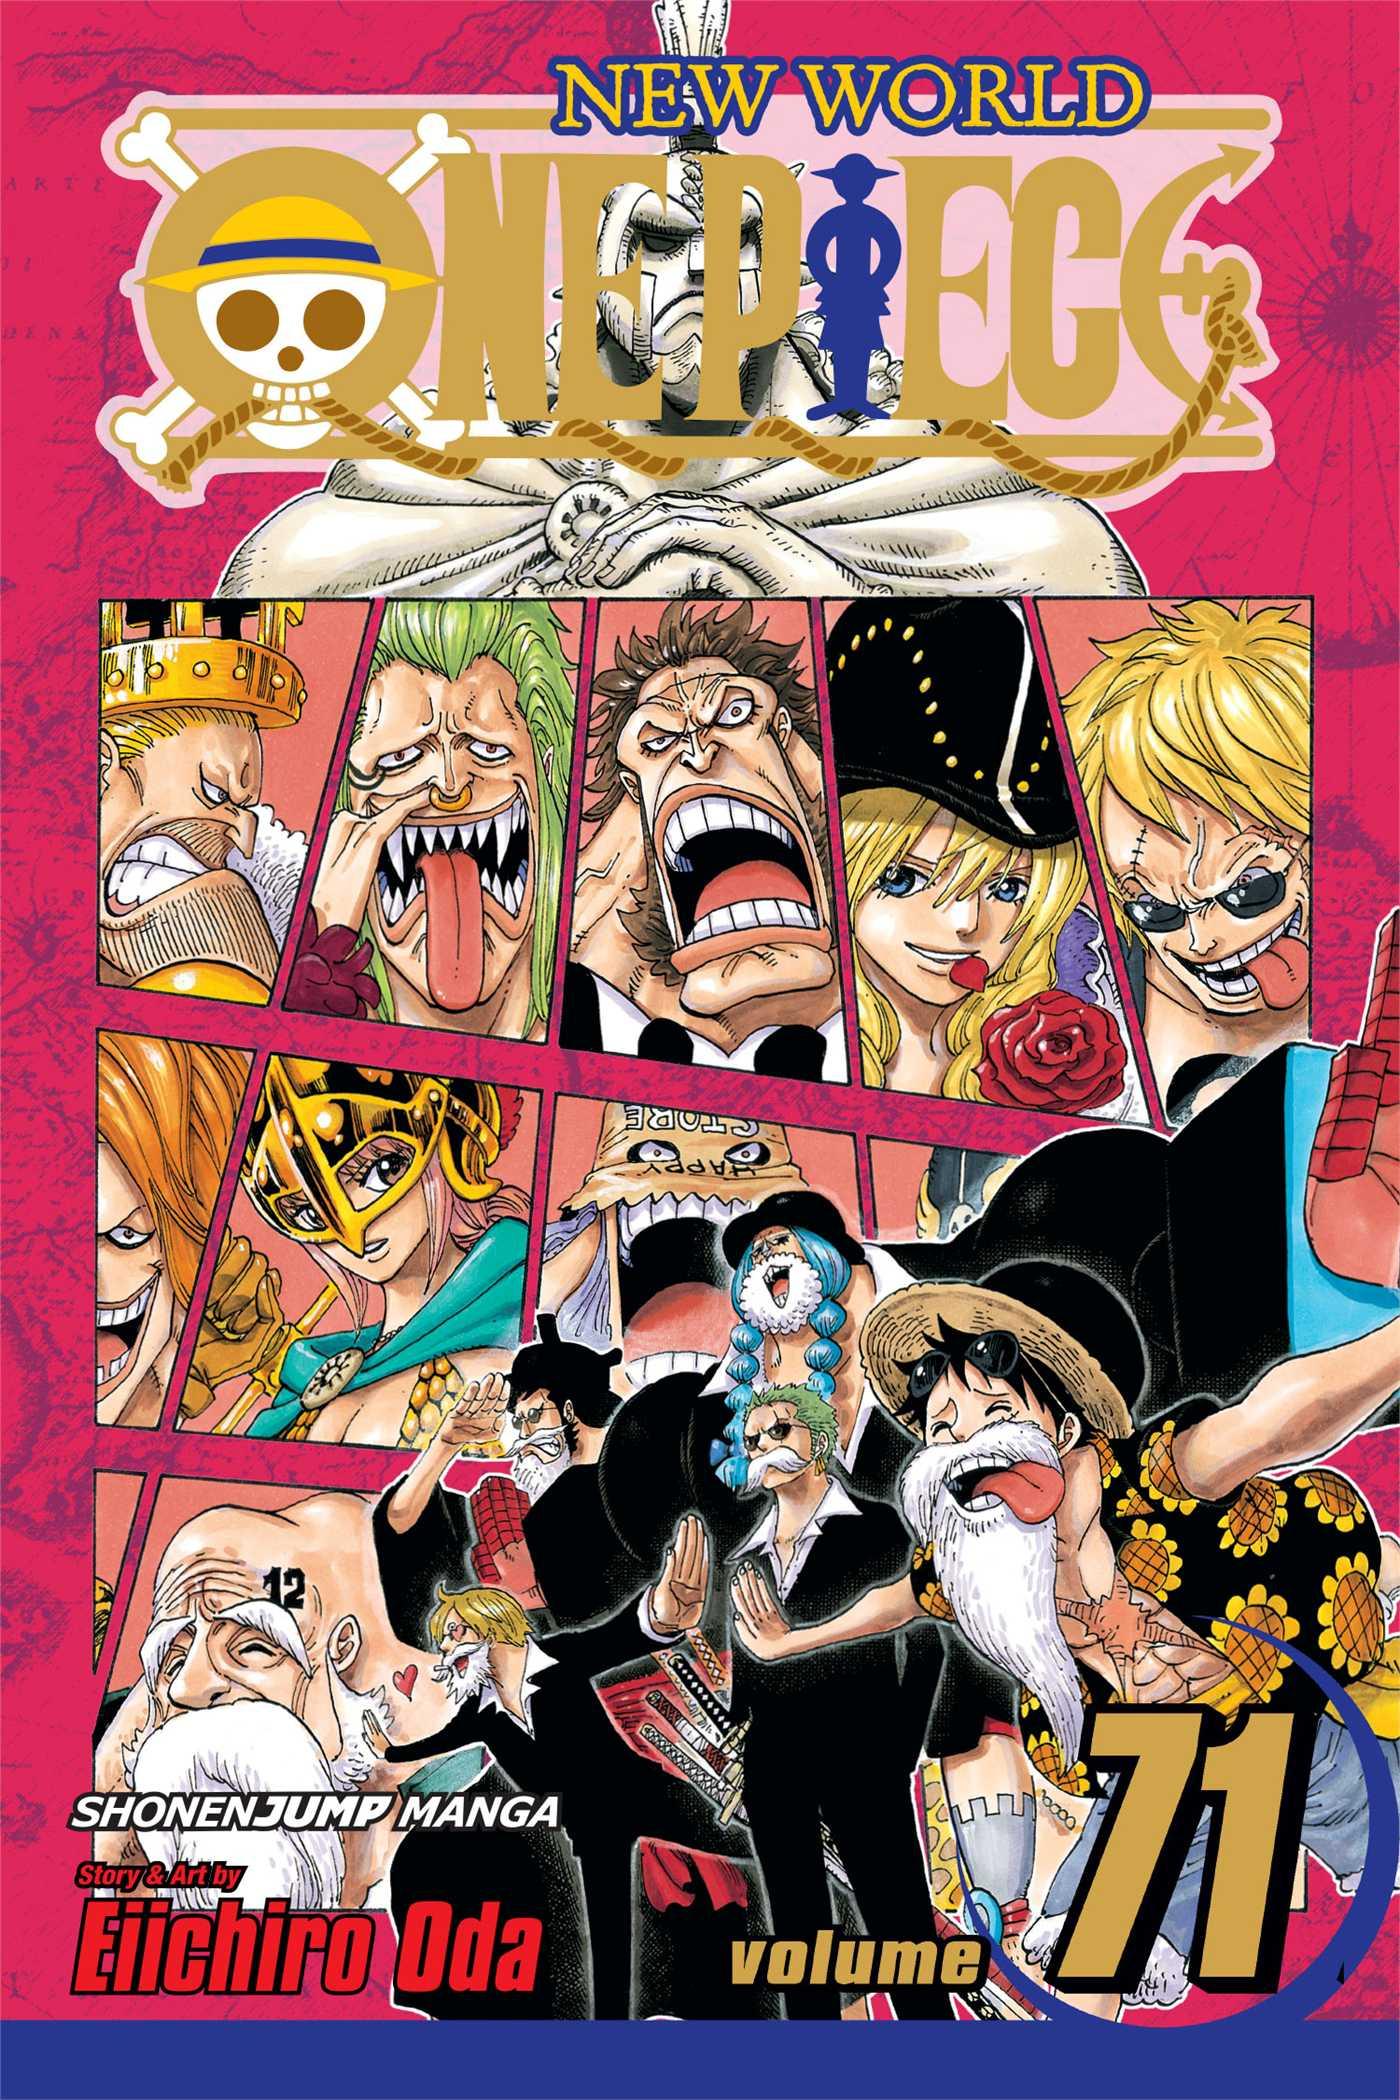 One Piece, Vol. 71   Book by Eiichiro Oda   Official ...